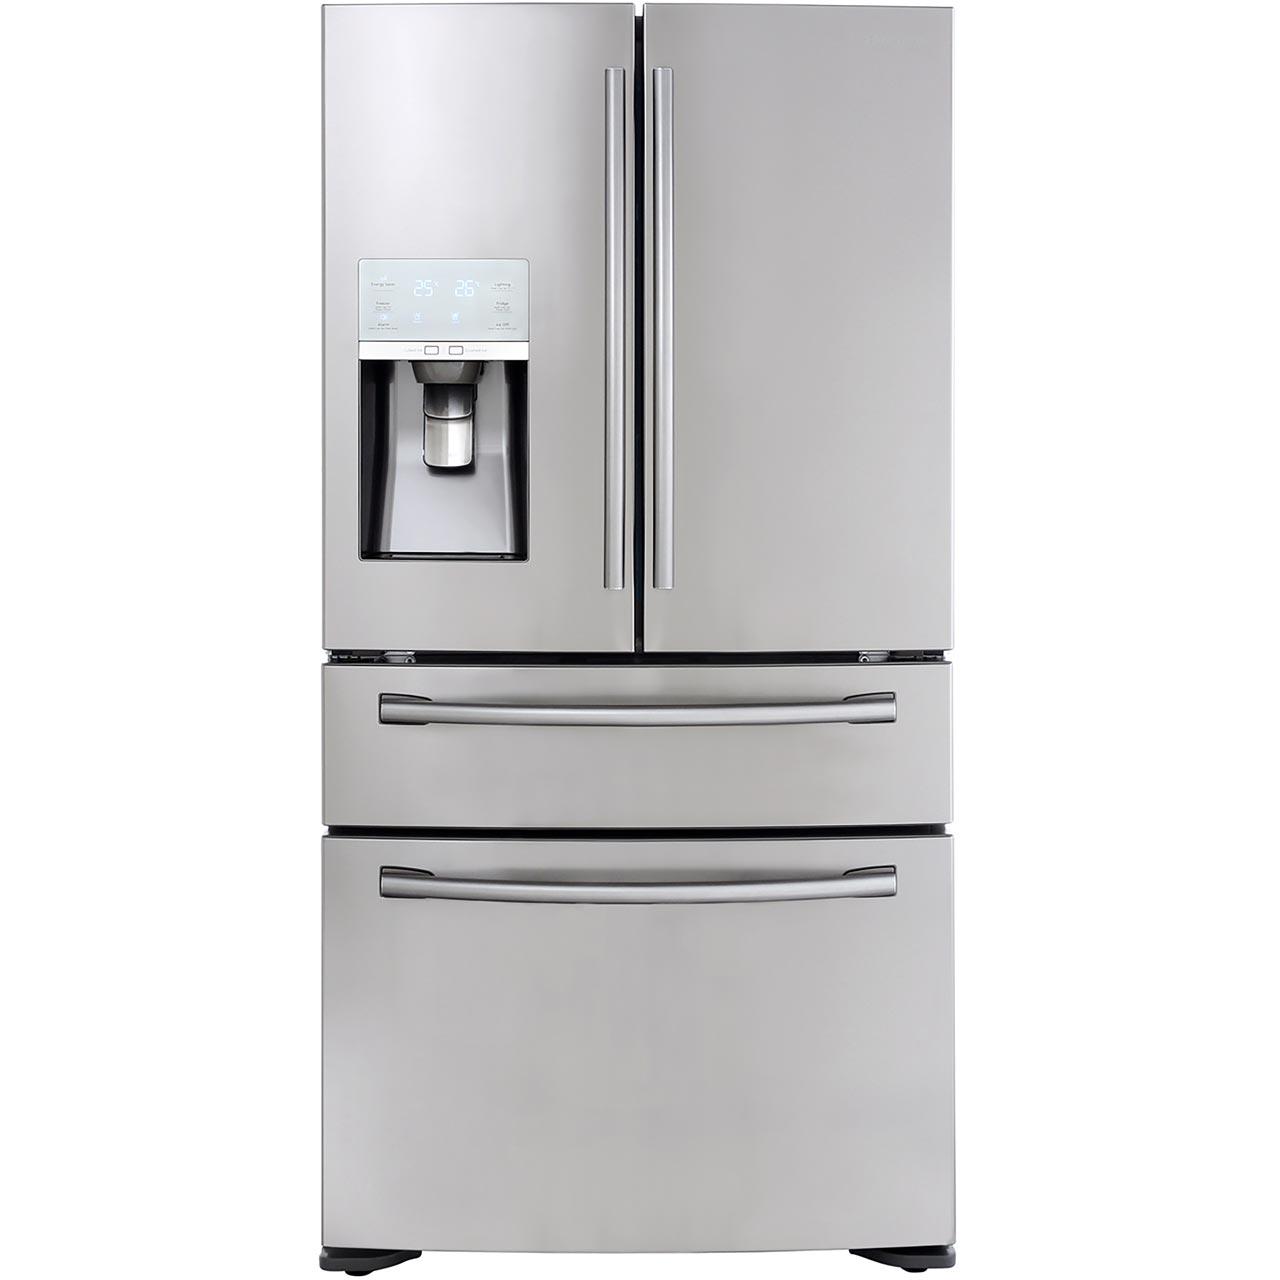 1b5995f483eb ... Samsung Four Door RF24FSEDBSR American Fridge Freezer - Stainless Steel  - A+ Rated - RF24FSEDBSR_SS ...